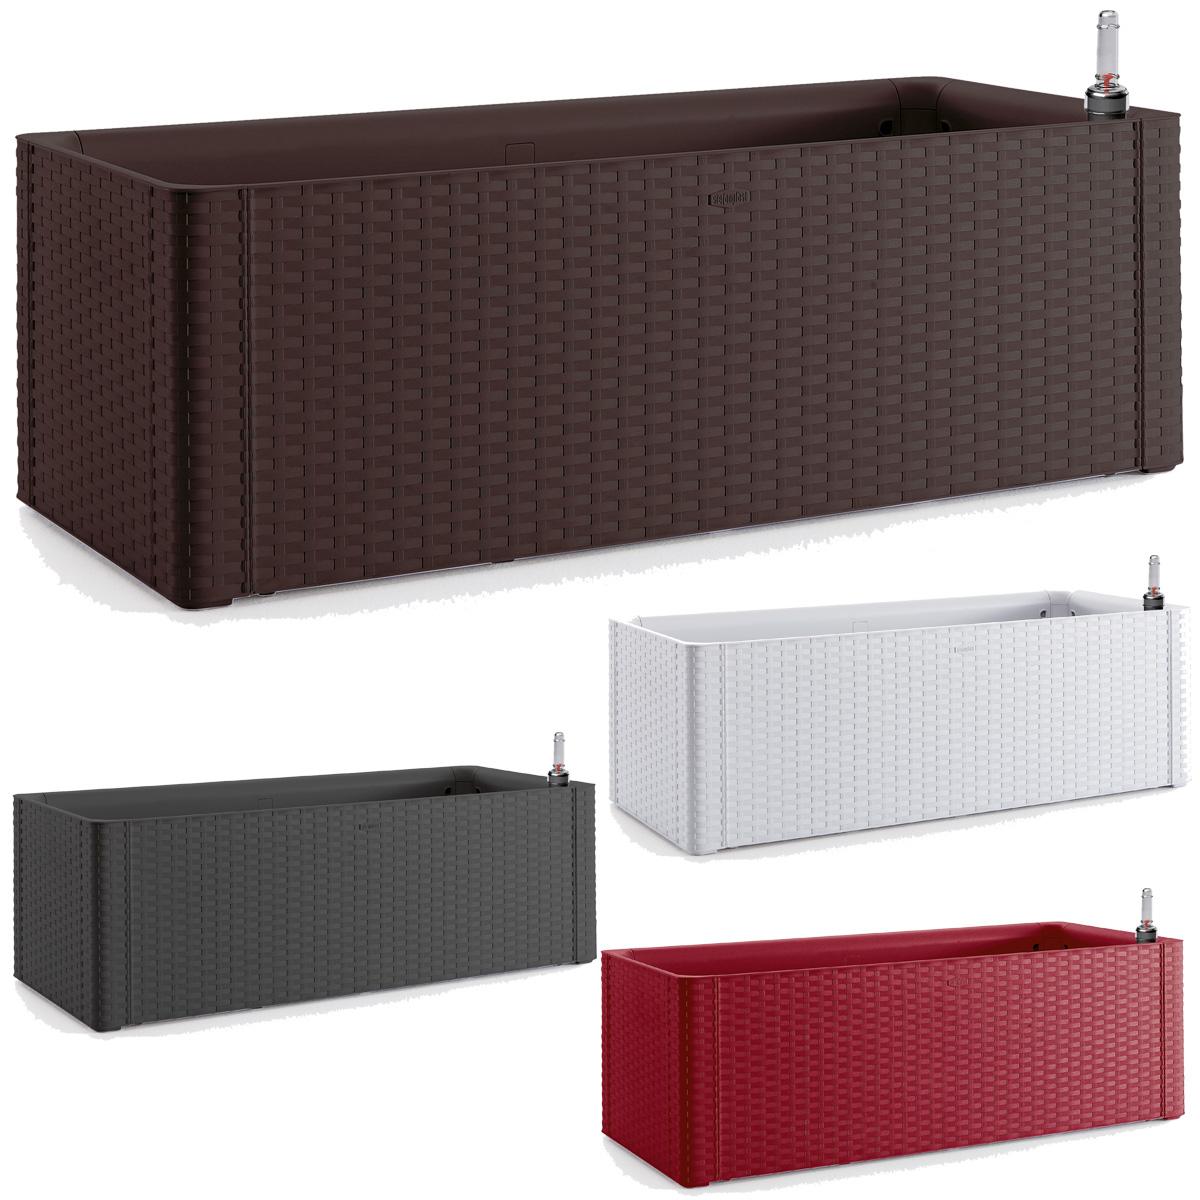 blumentopf balkonk bel blumenkasten pflanzkasten blumenk bel bew sserungssystem ebay. Black Bedroom Furniture Sets. Home Design Ideas